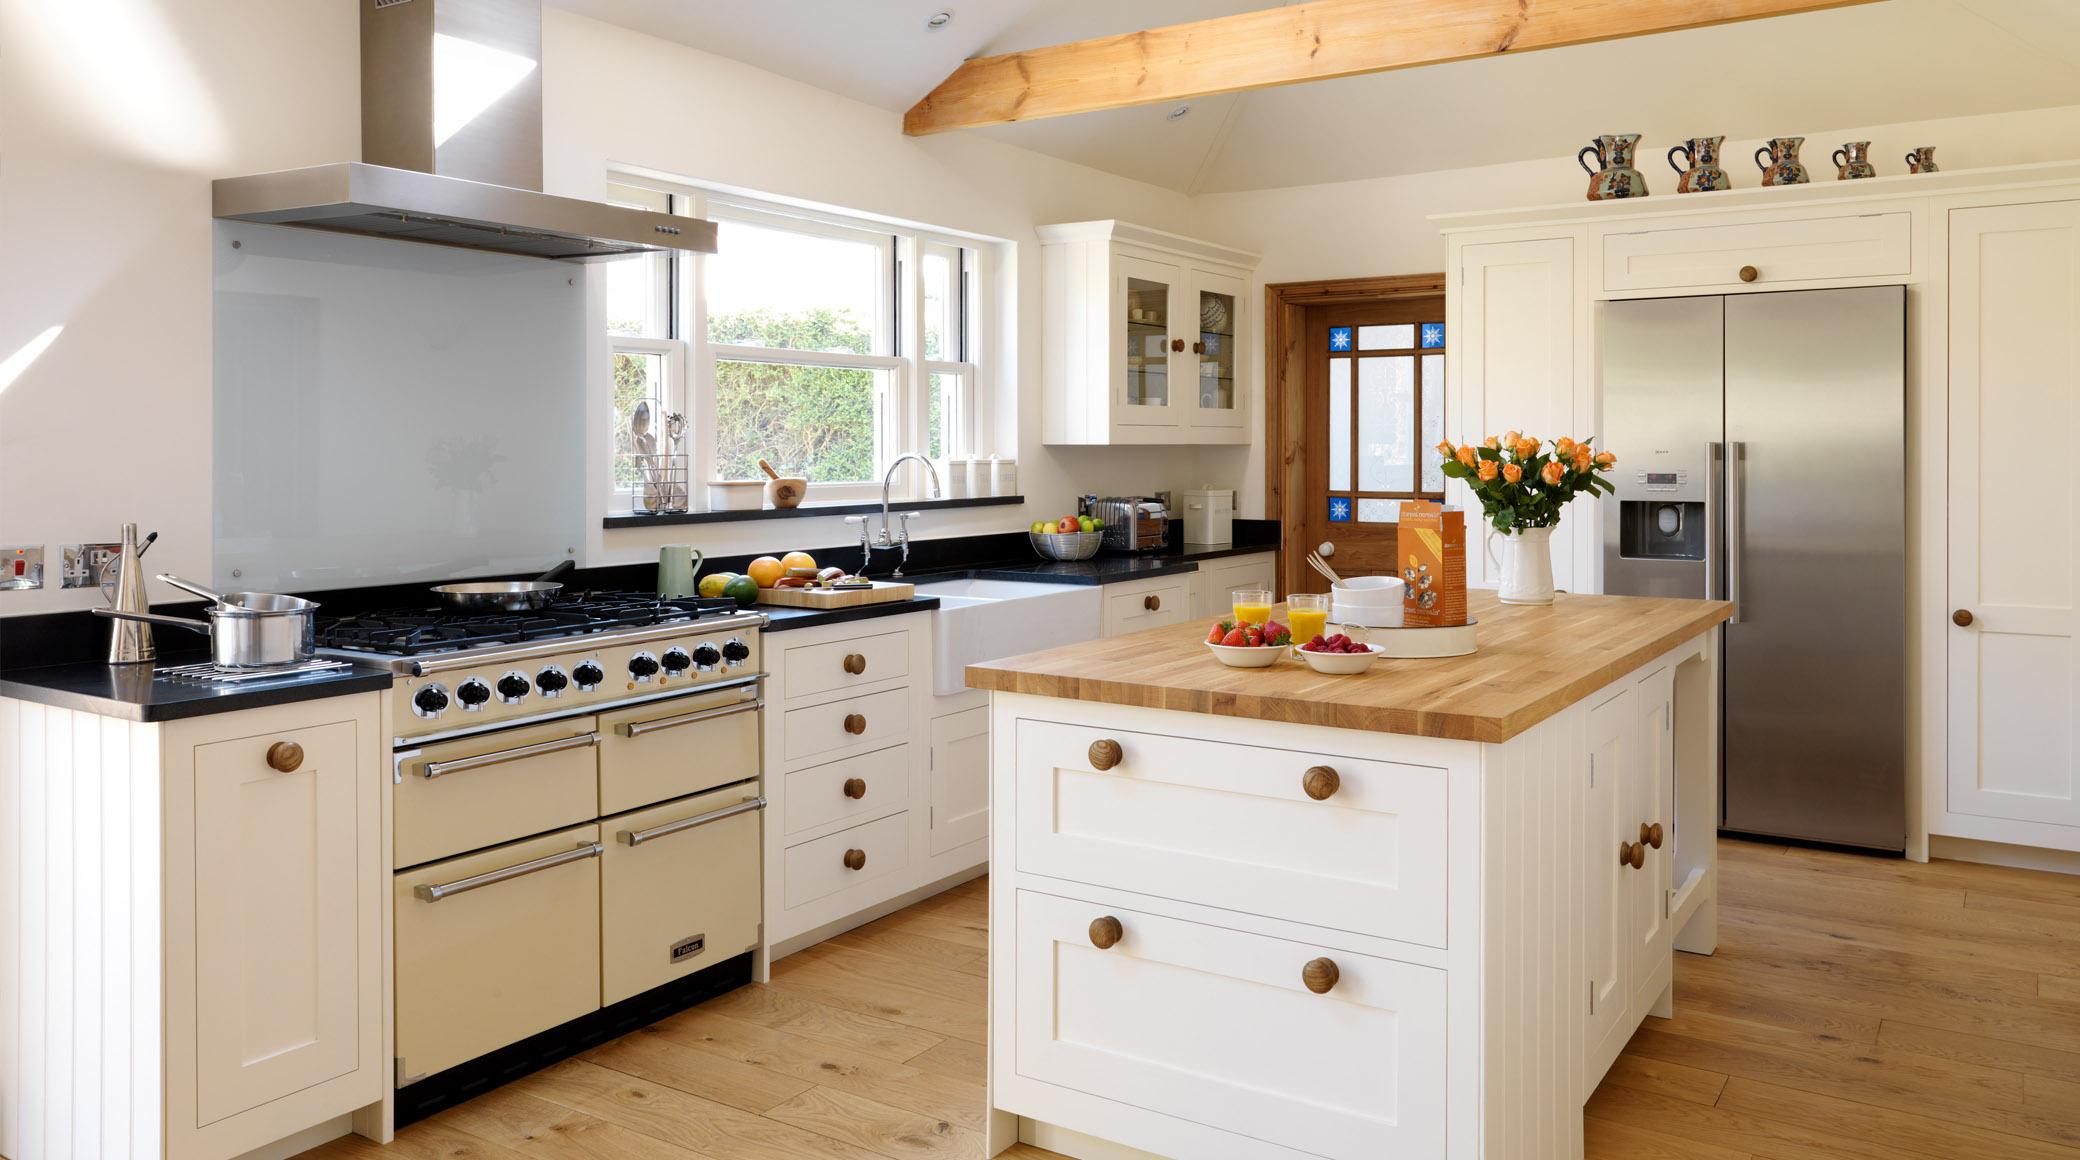 country style kitchens kitchen ideas   kitchen floor ideas